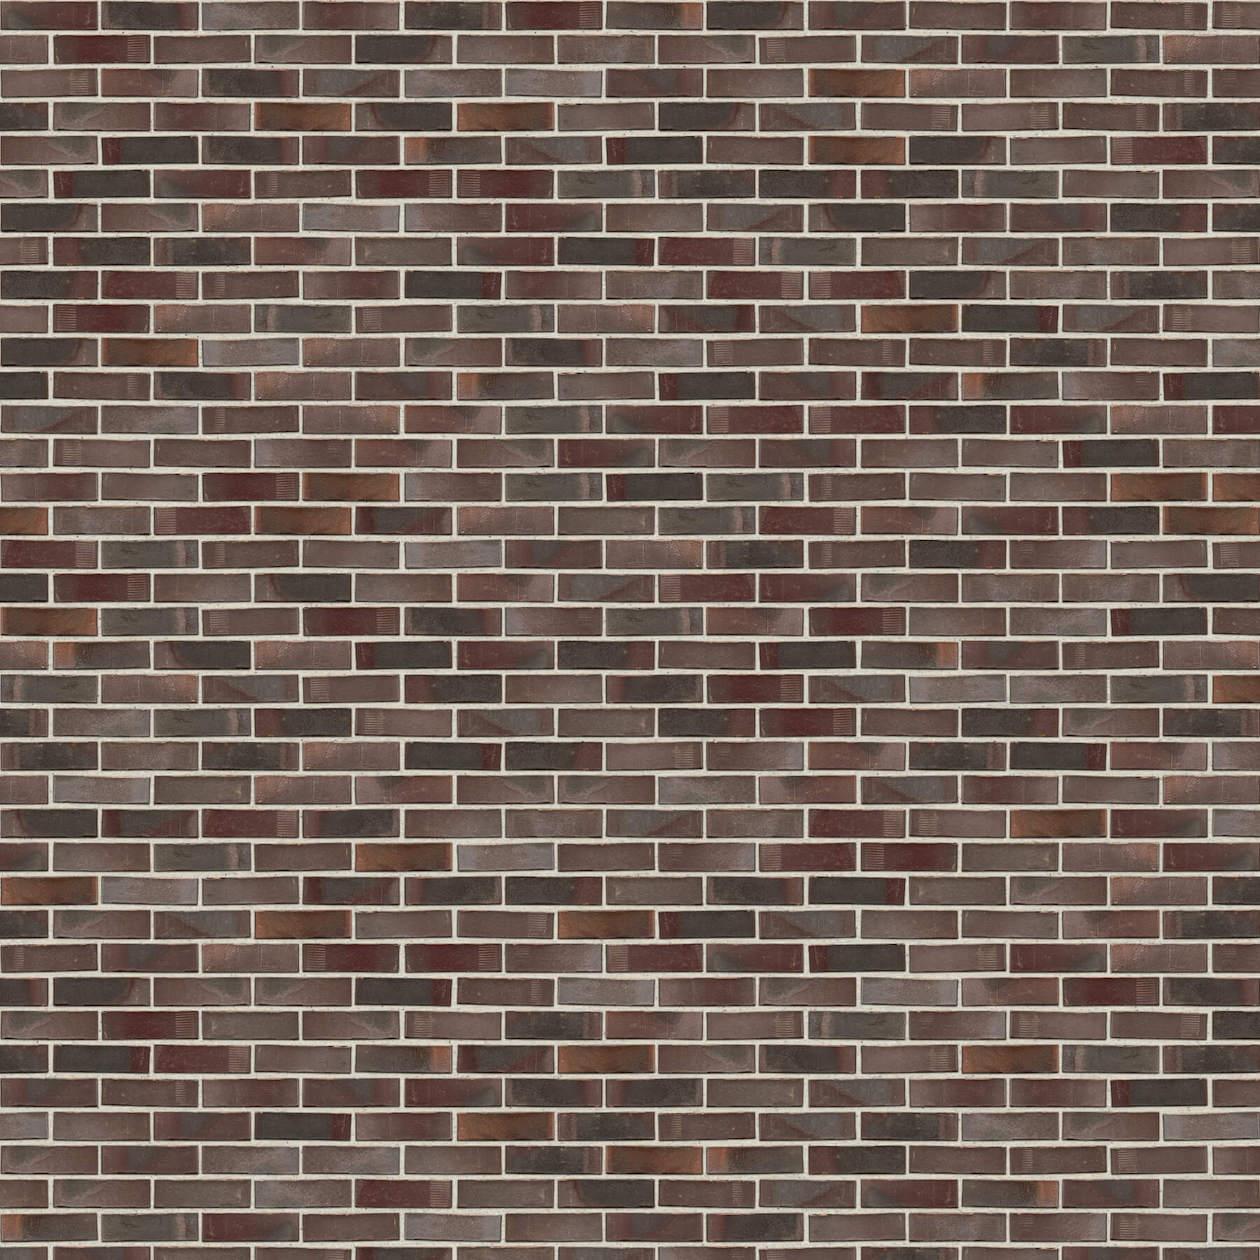 Puna-cigla-FeldHaus-Klinker-brick-house-nf-k-704-Bela Fuga